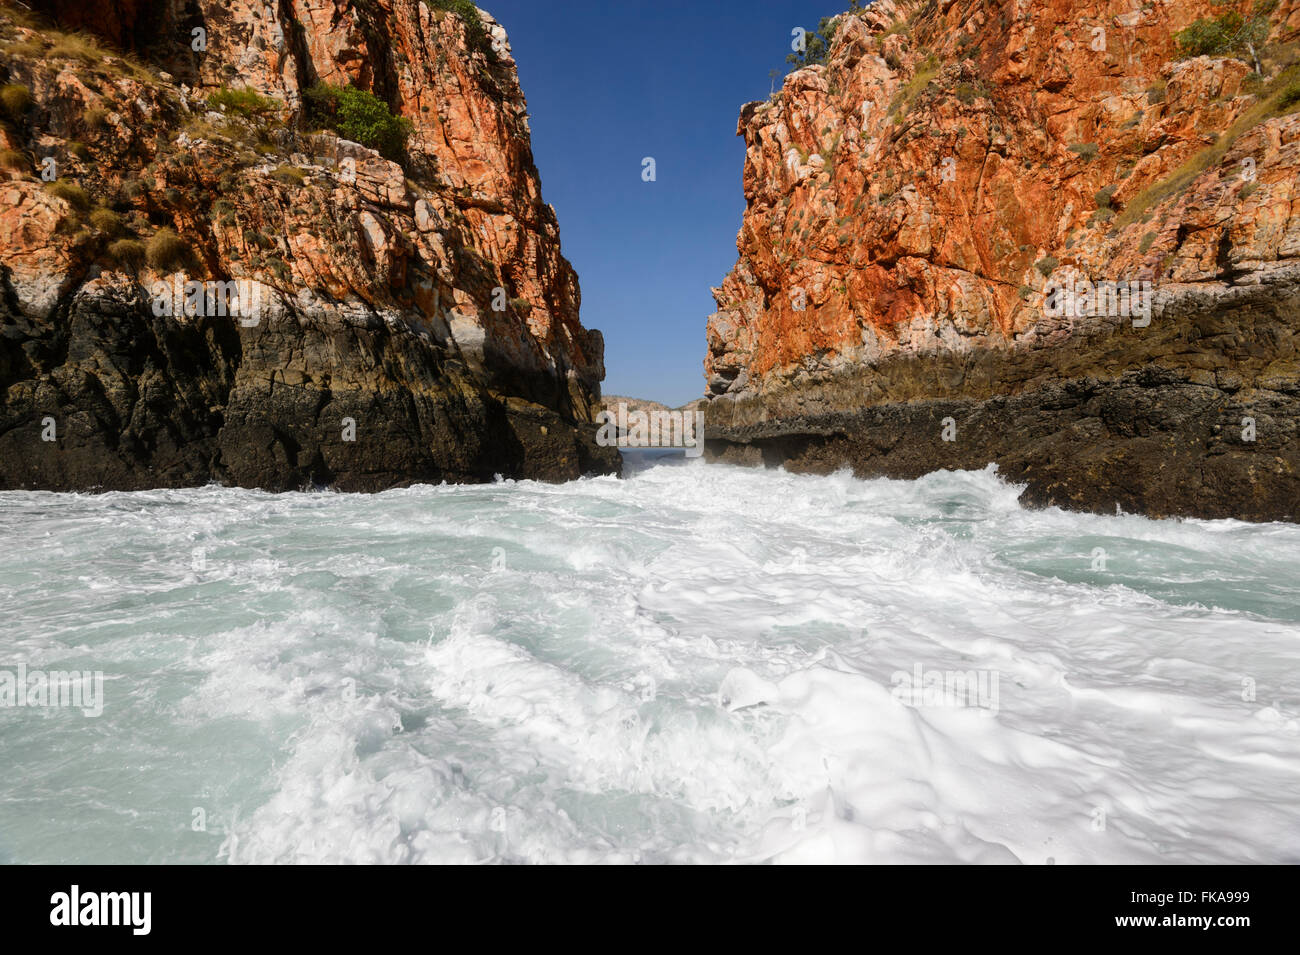 Chutes horizontales, région de Kimberley, Australie occidentale Photo Stock